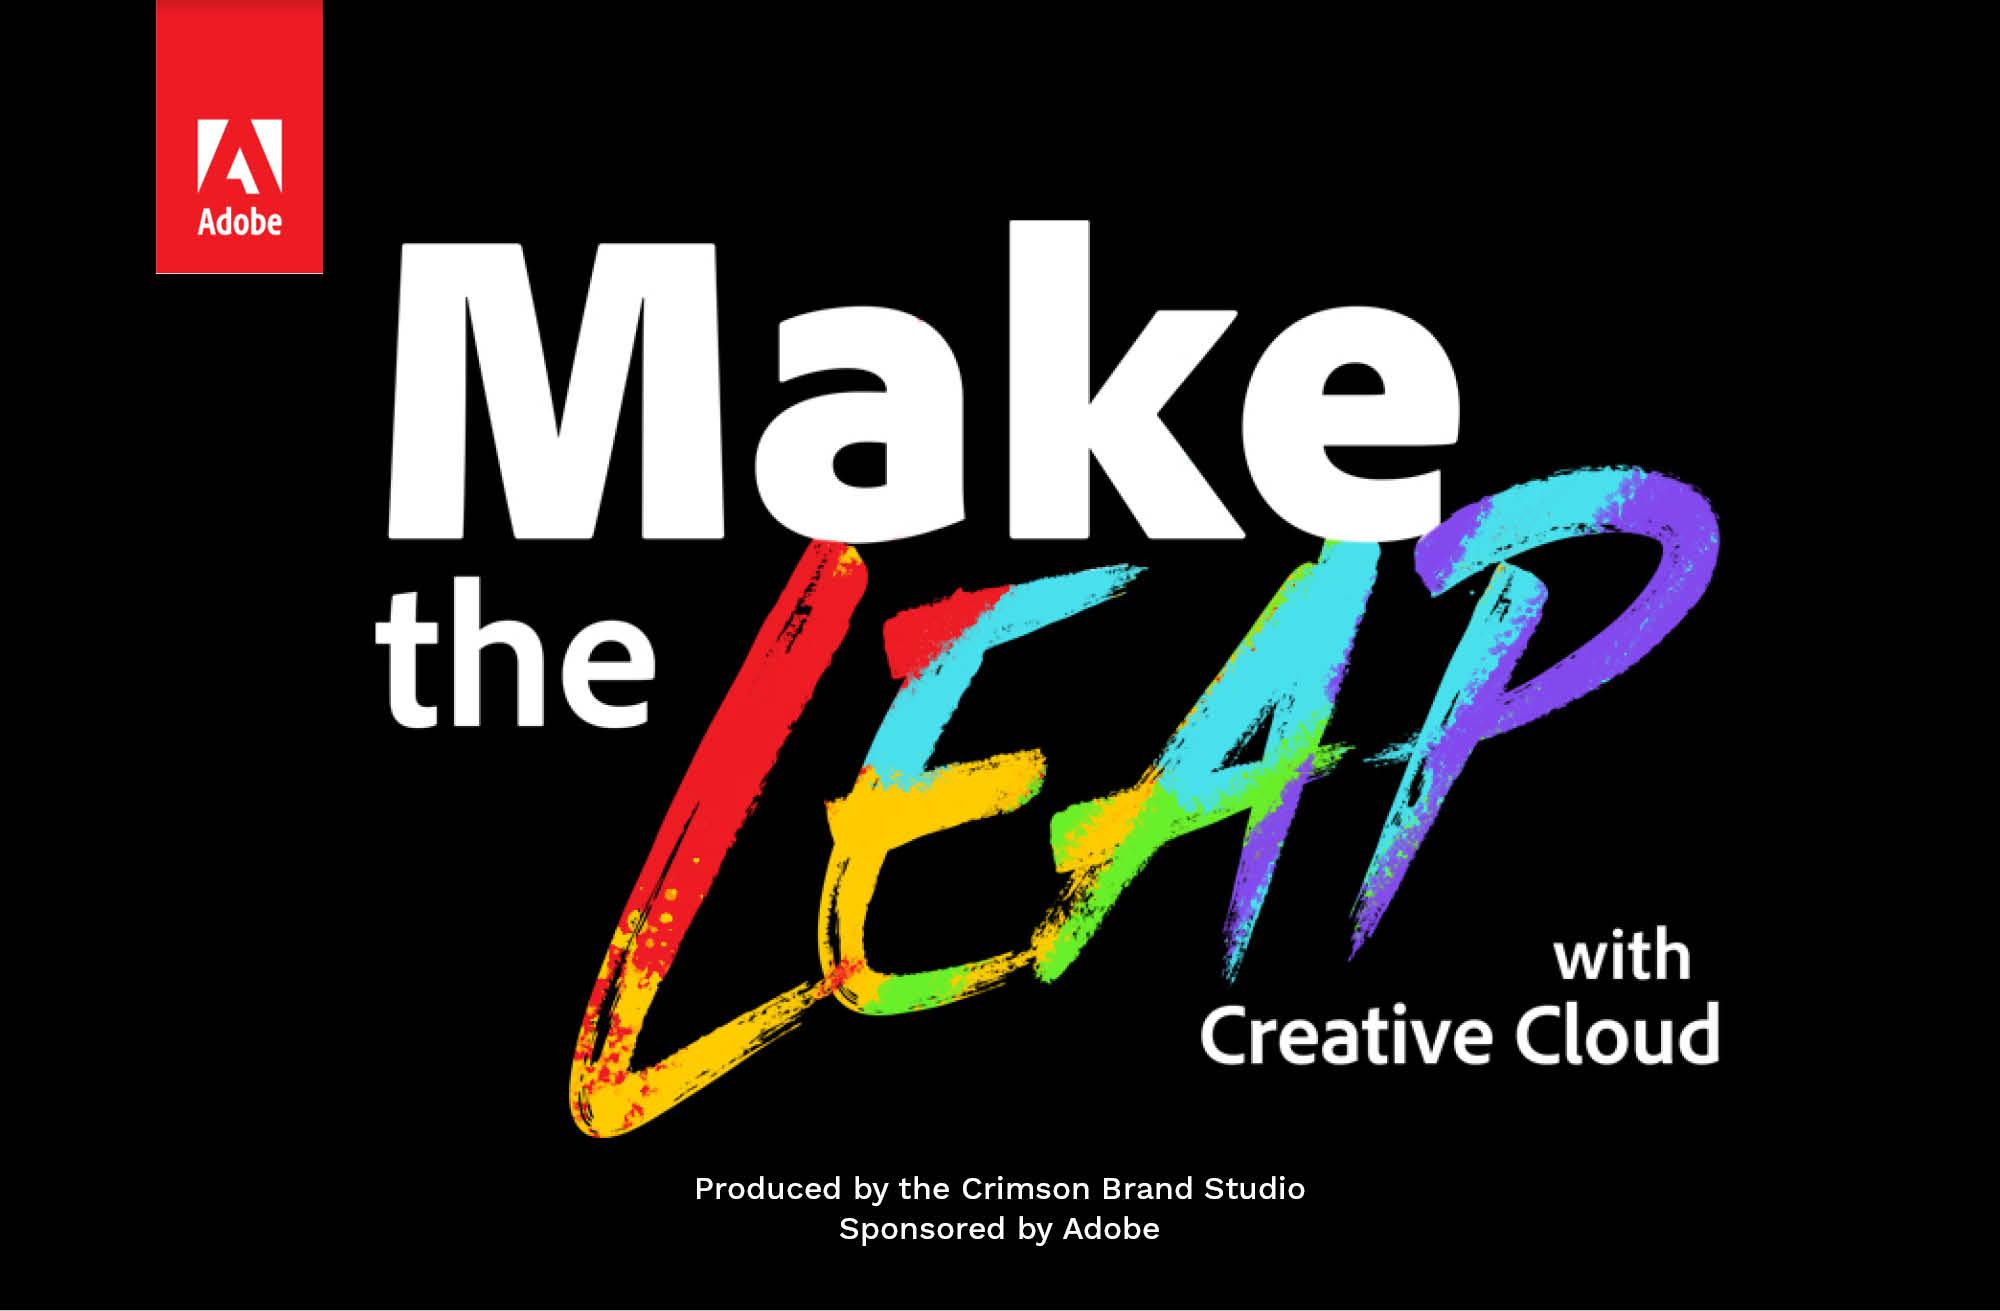 Adobe Make The Leap With Creative Cloud Sponsored The Harvard Crimson